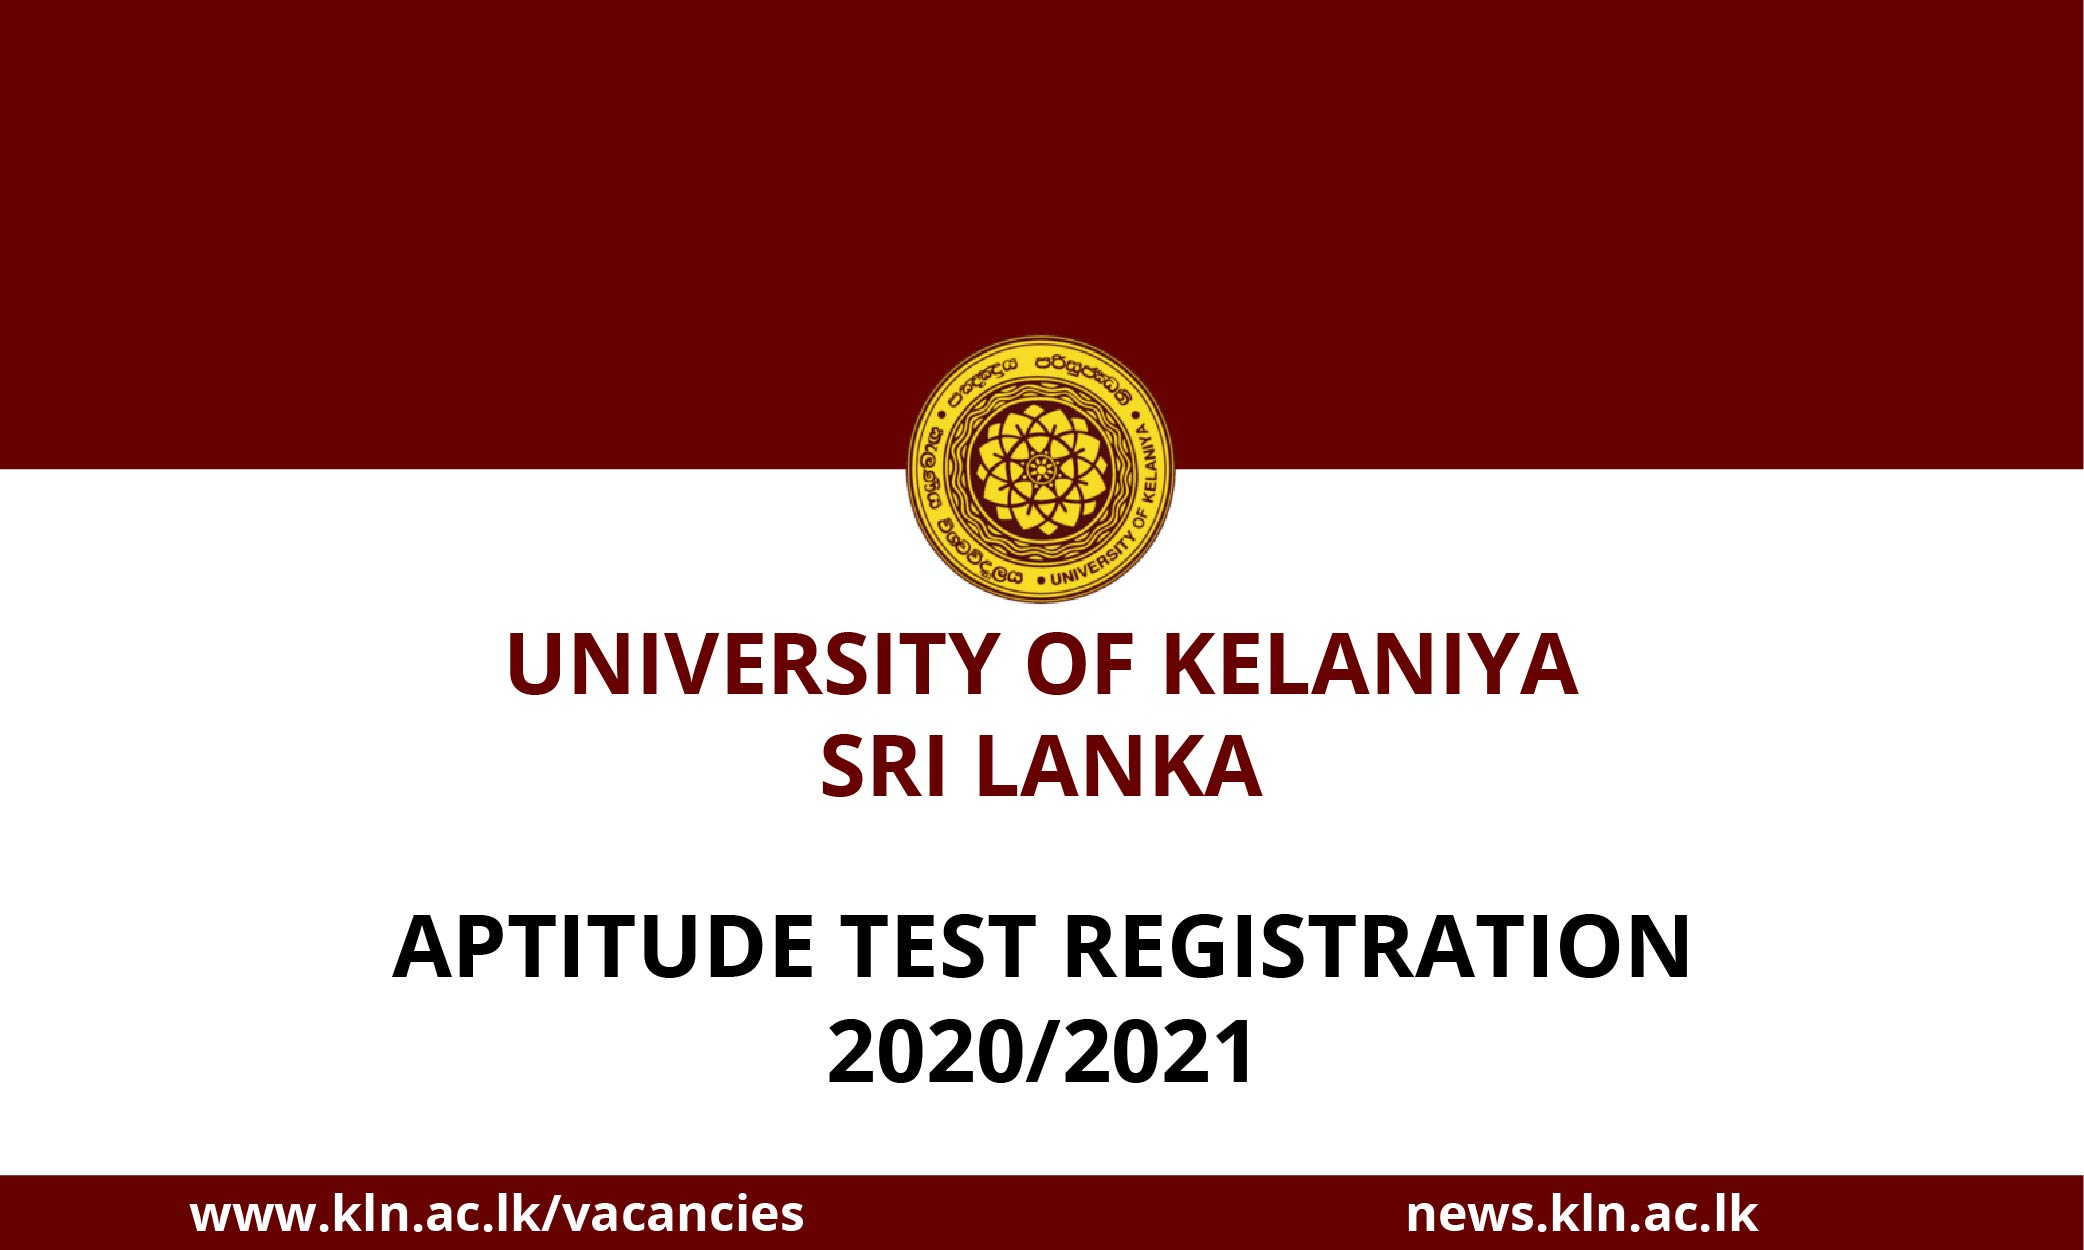 New undergraduate programmes and Aptitude Tests offered by the University ofKelaniya